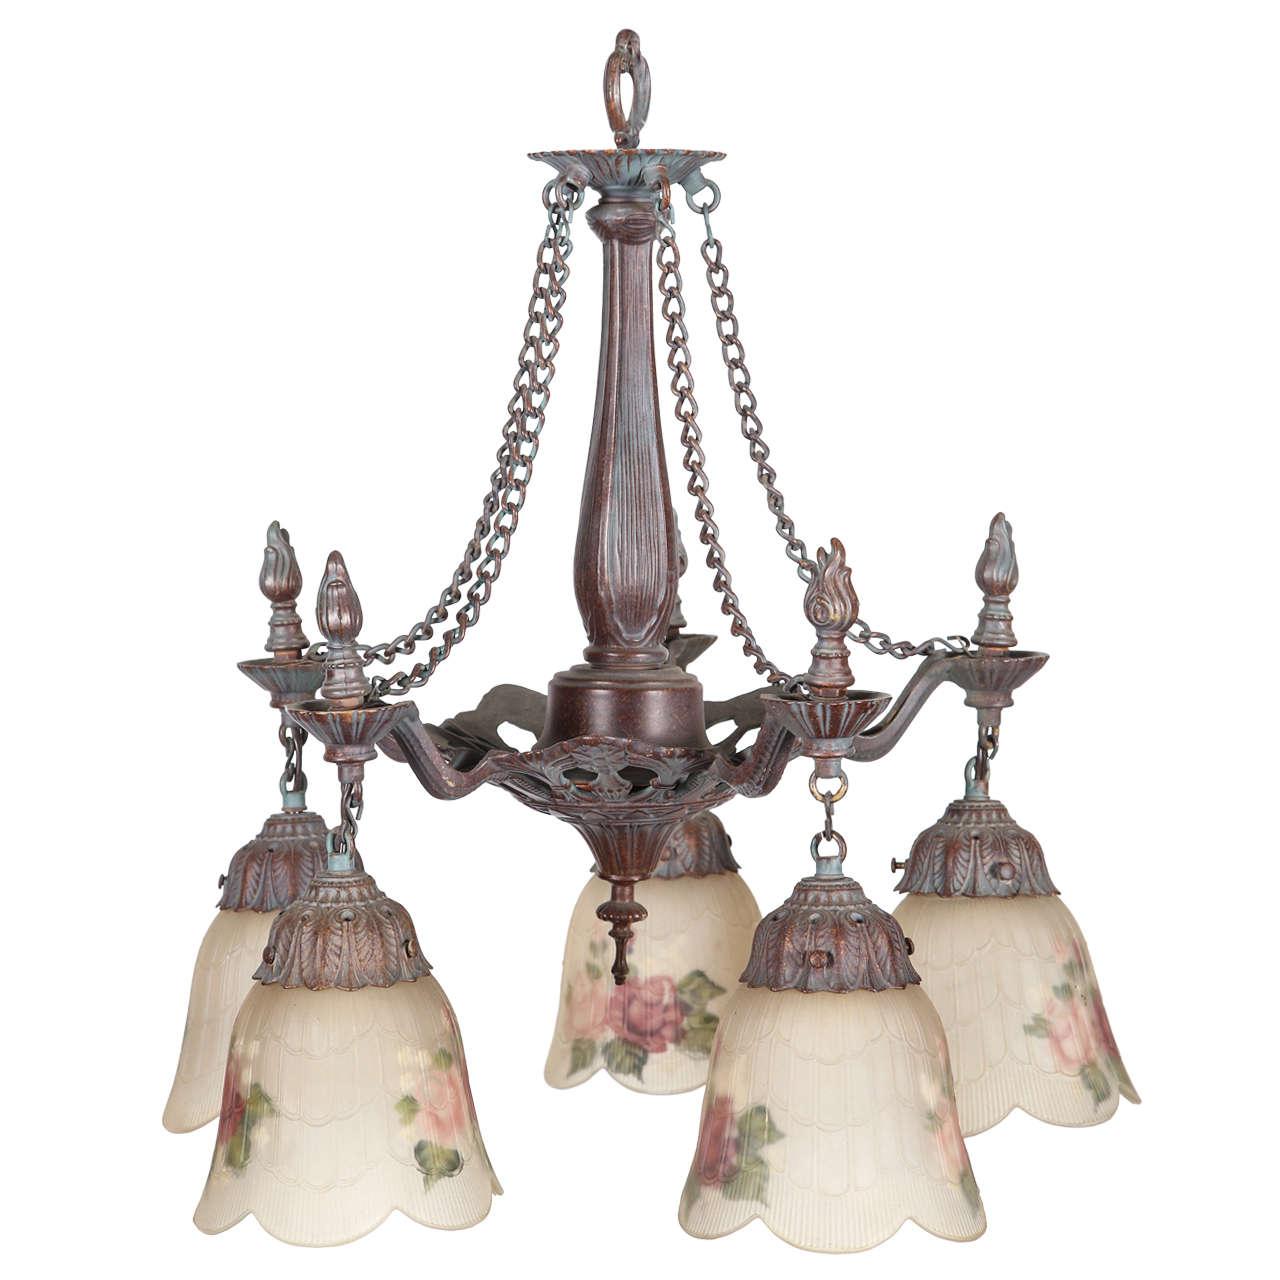 Nickle plated art nouveau five light chandelier at 1stdibs for Chandelier art nouveau